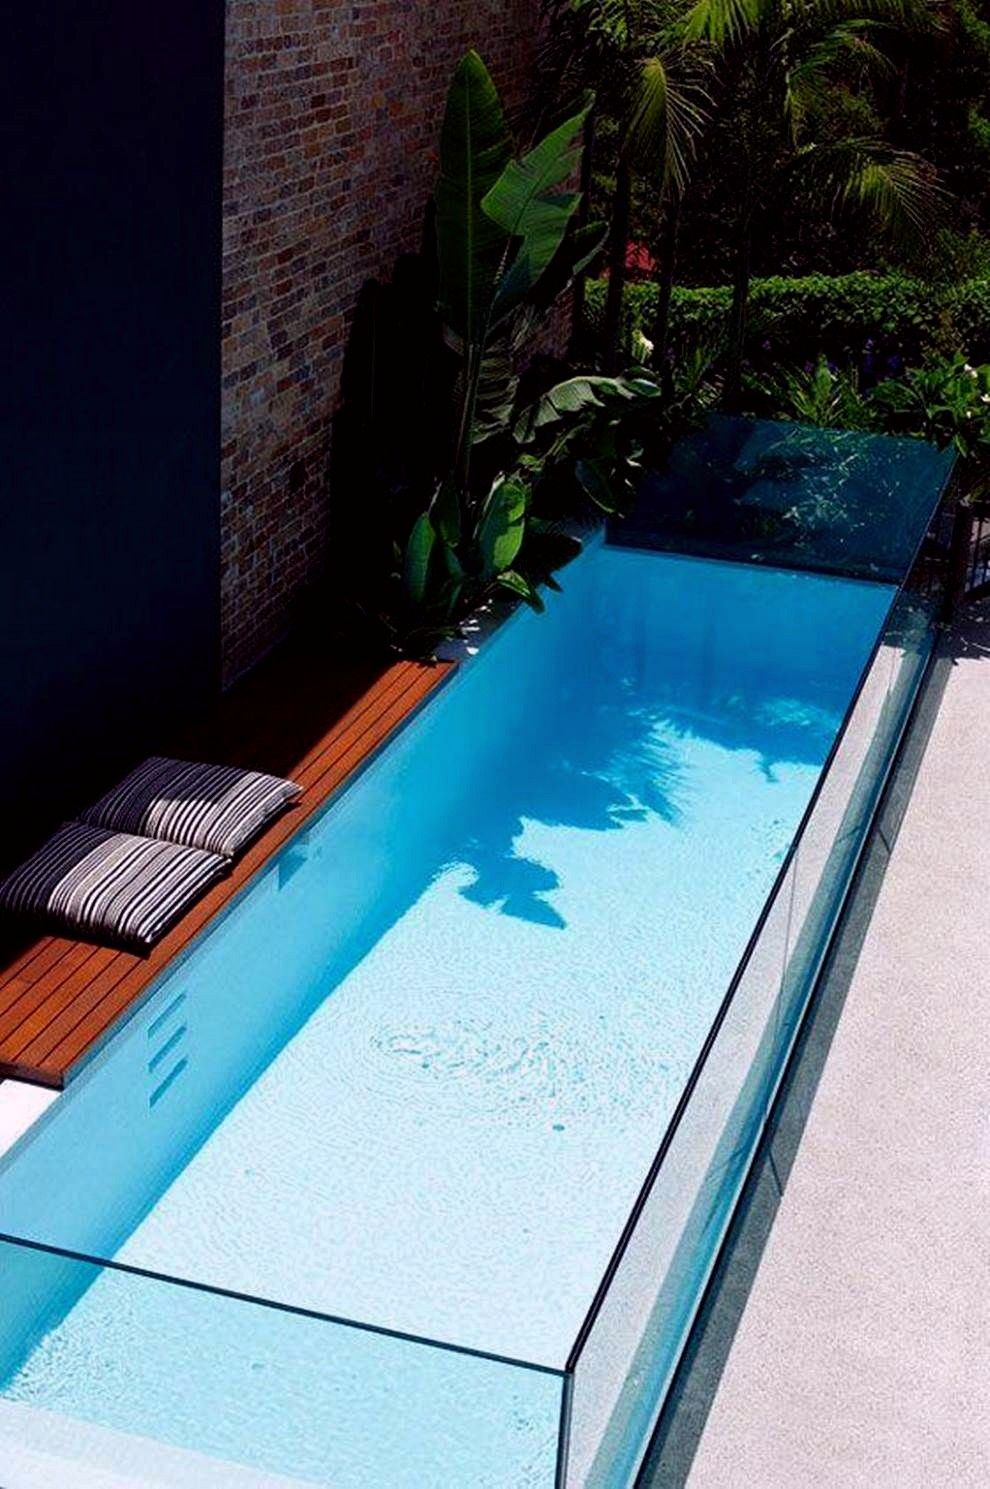 35 Small Backyard Swimming Pool Designs Ideas You Ll Love Homelovers Kolam Kecil Kolam Taman Arsitektur